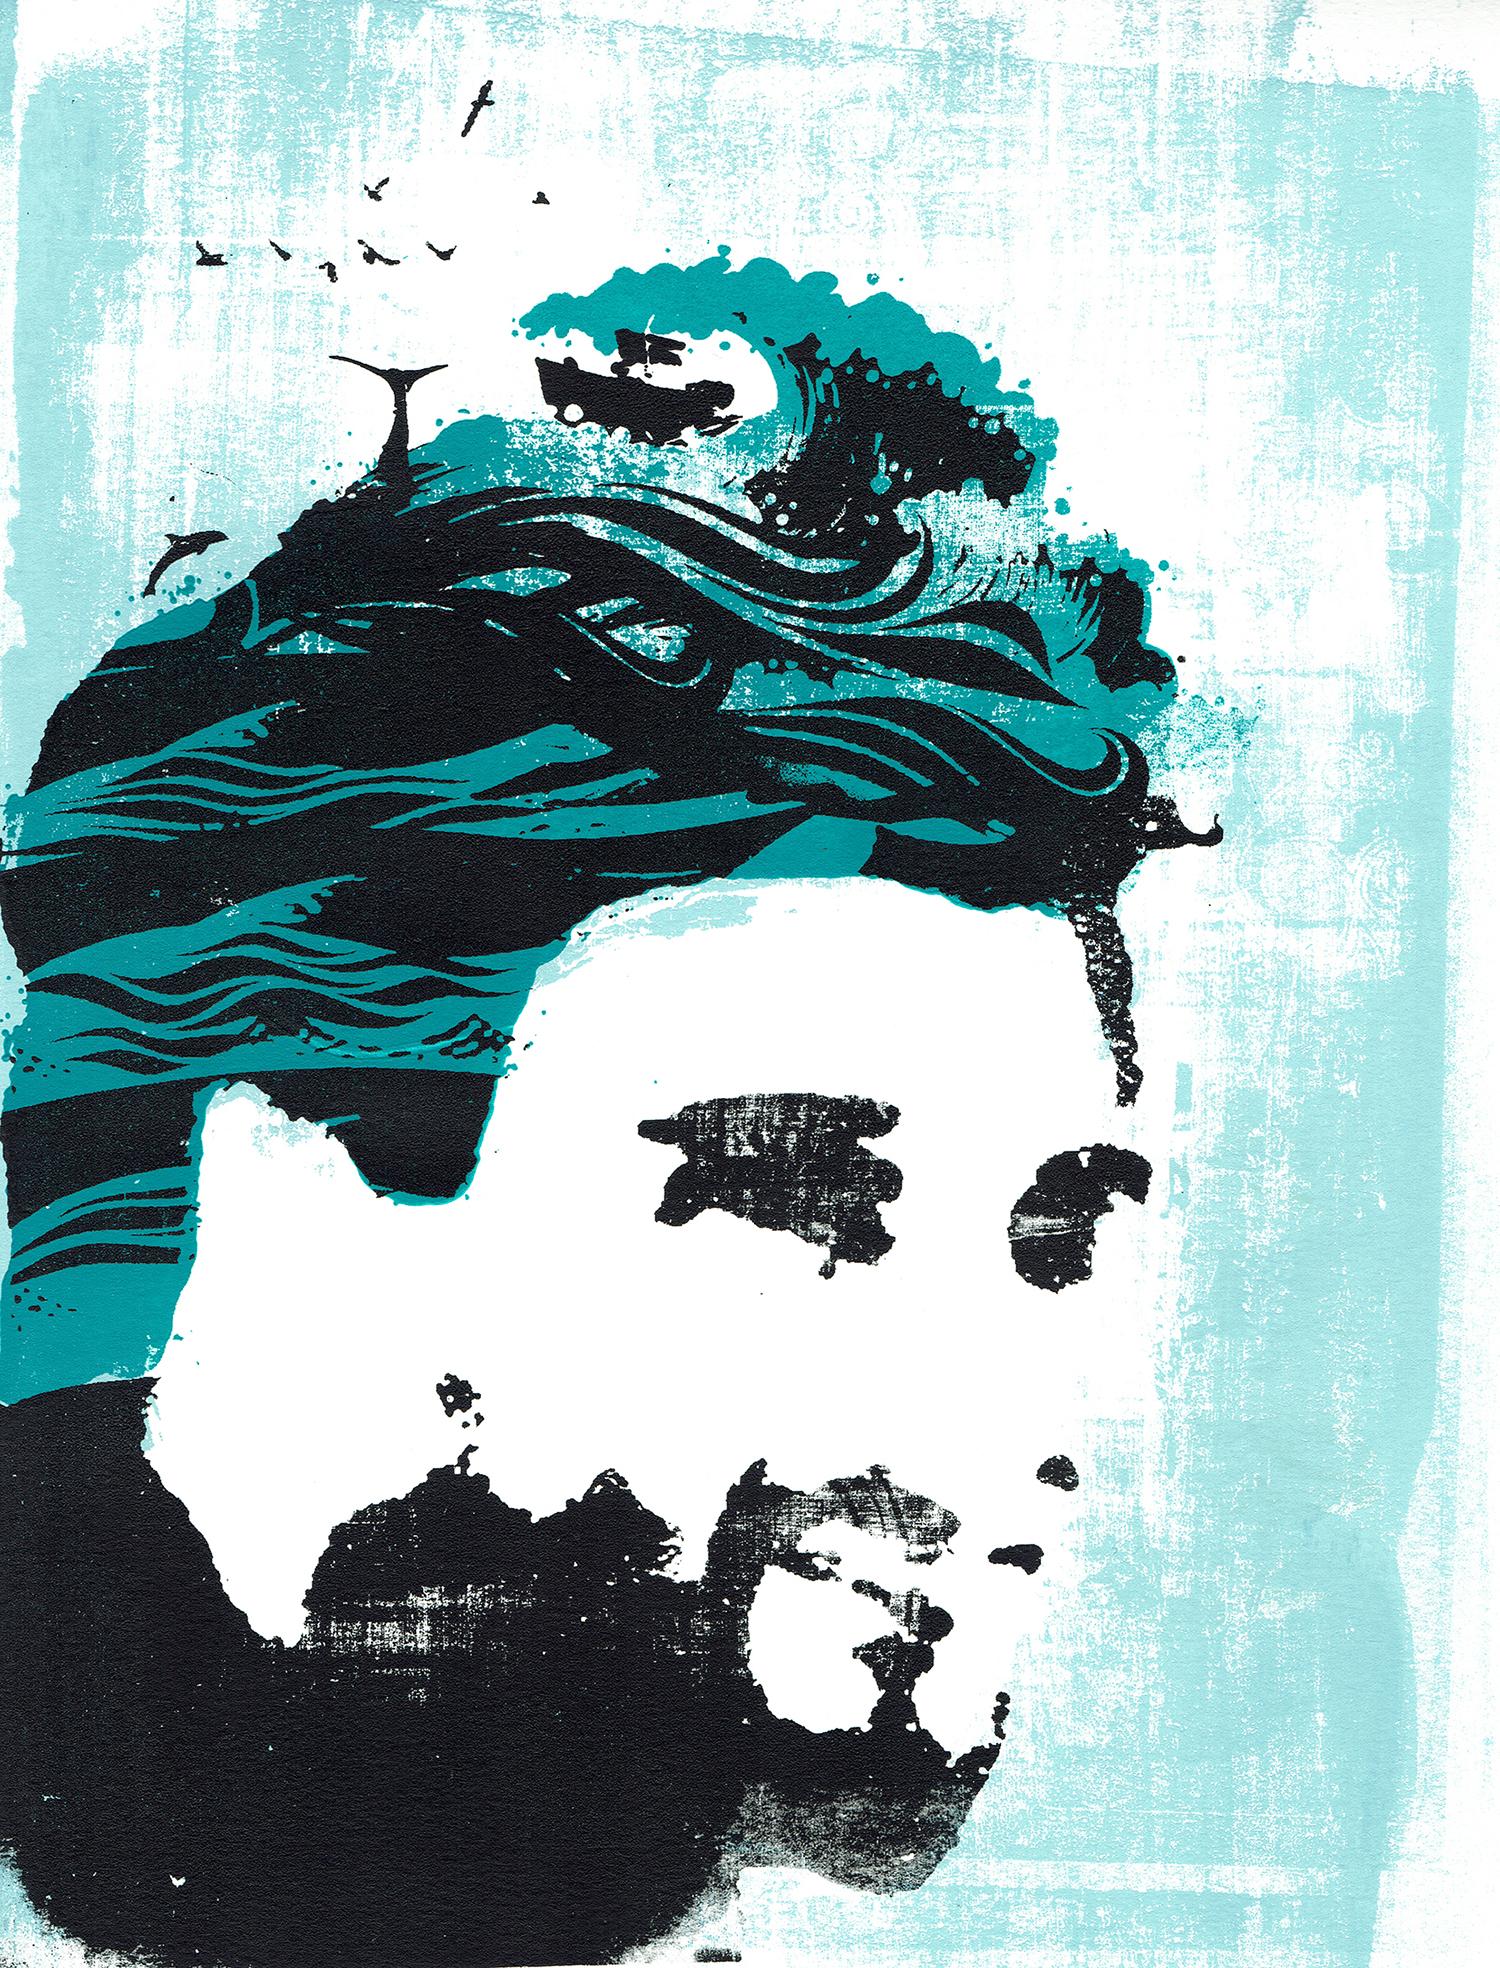 dreaming_of_the_sea_waves_boat_hair_screenprint_katie_edwards_illustration_art.jpg